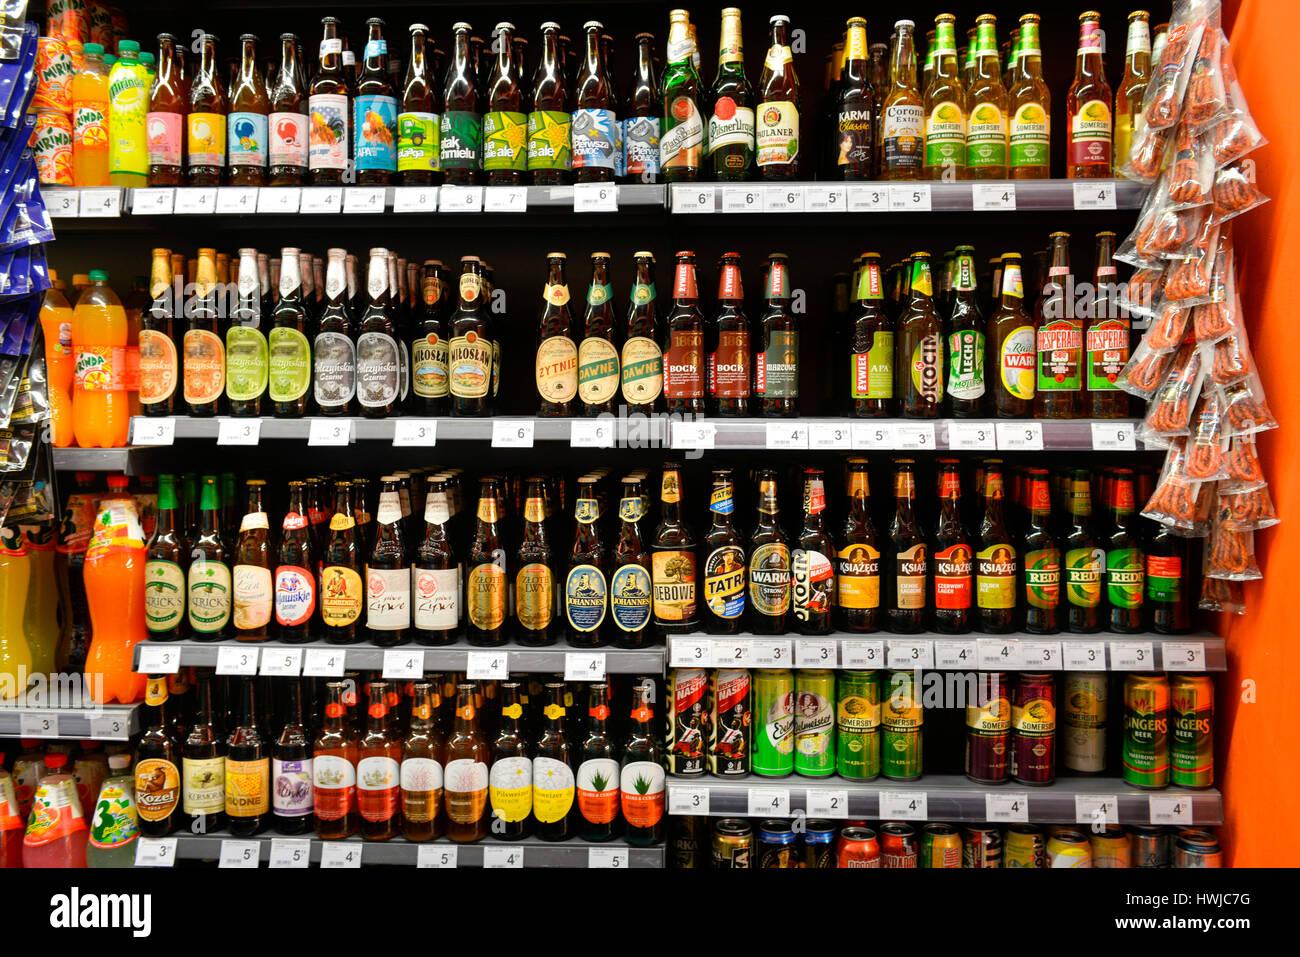 Getraenke, Lebensmittelgeschaeft, Krakau, Polen - Stock Image